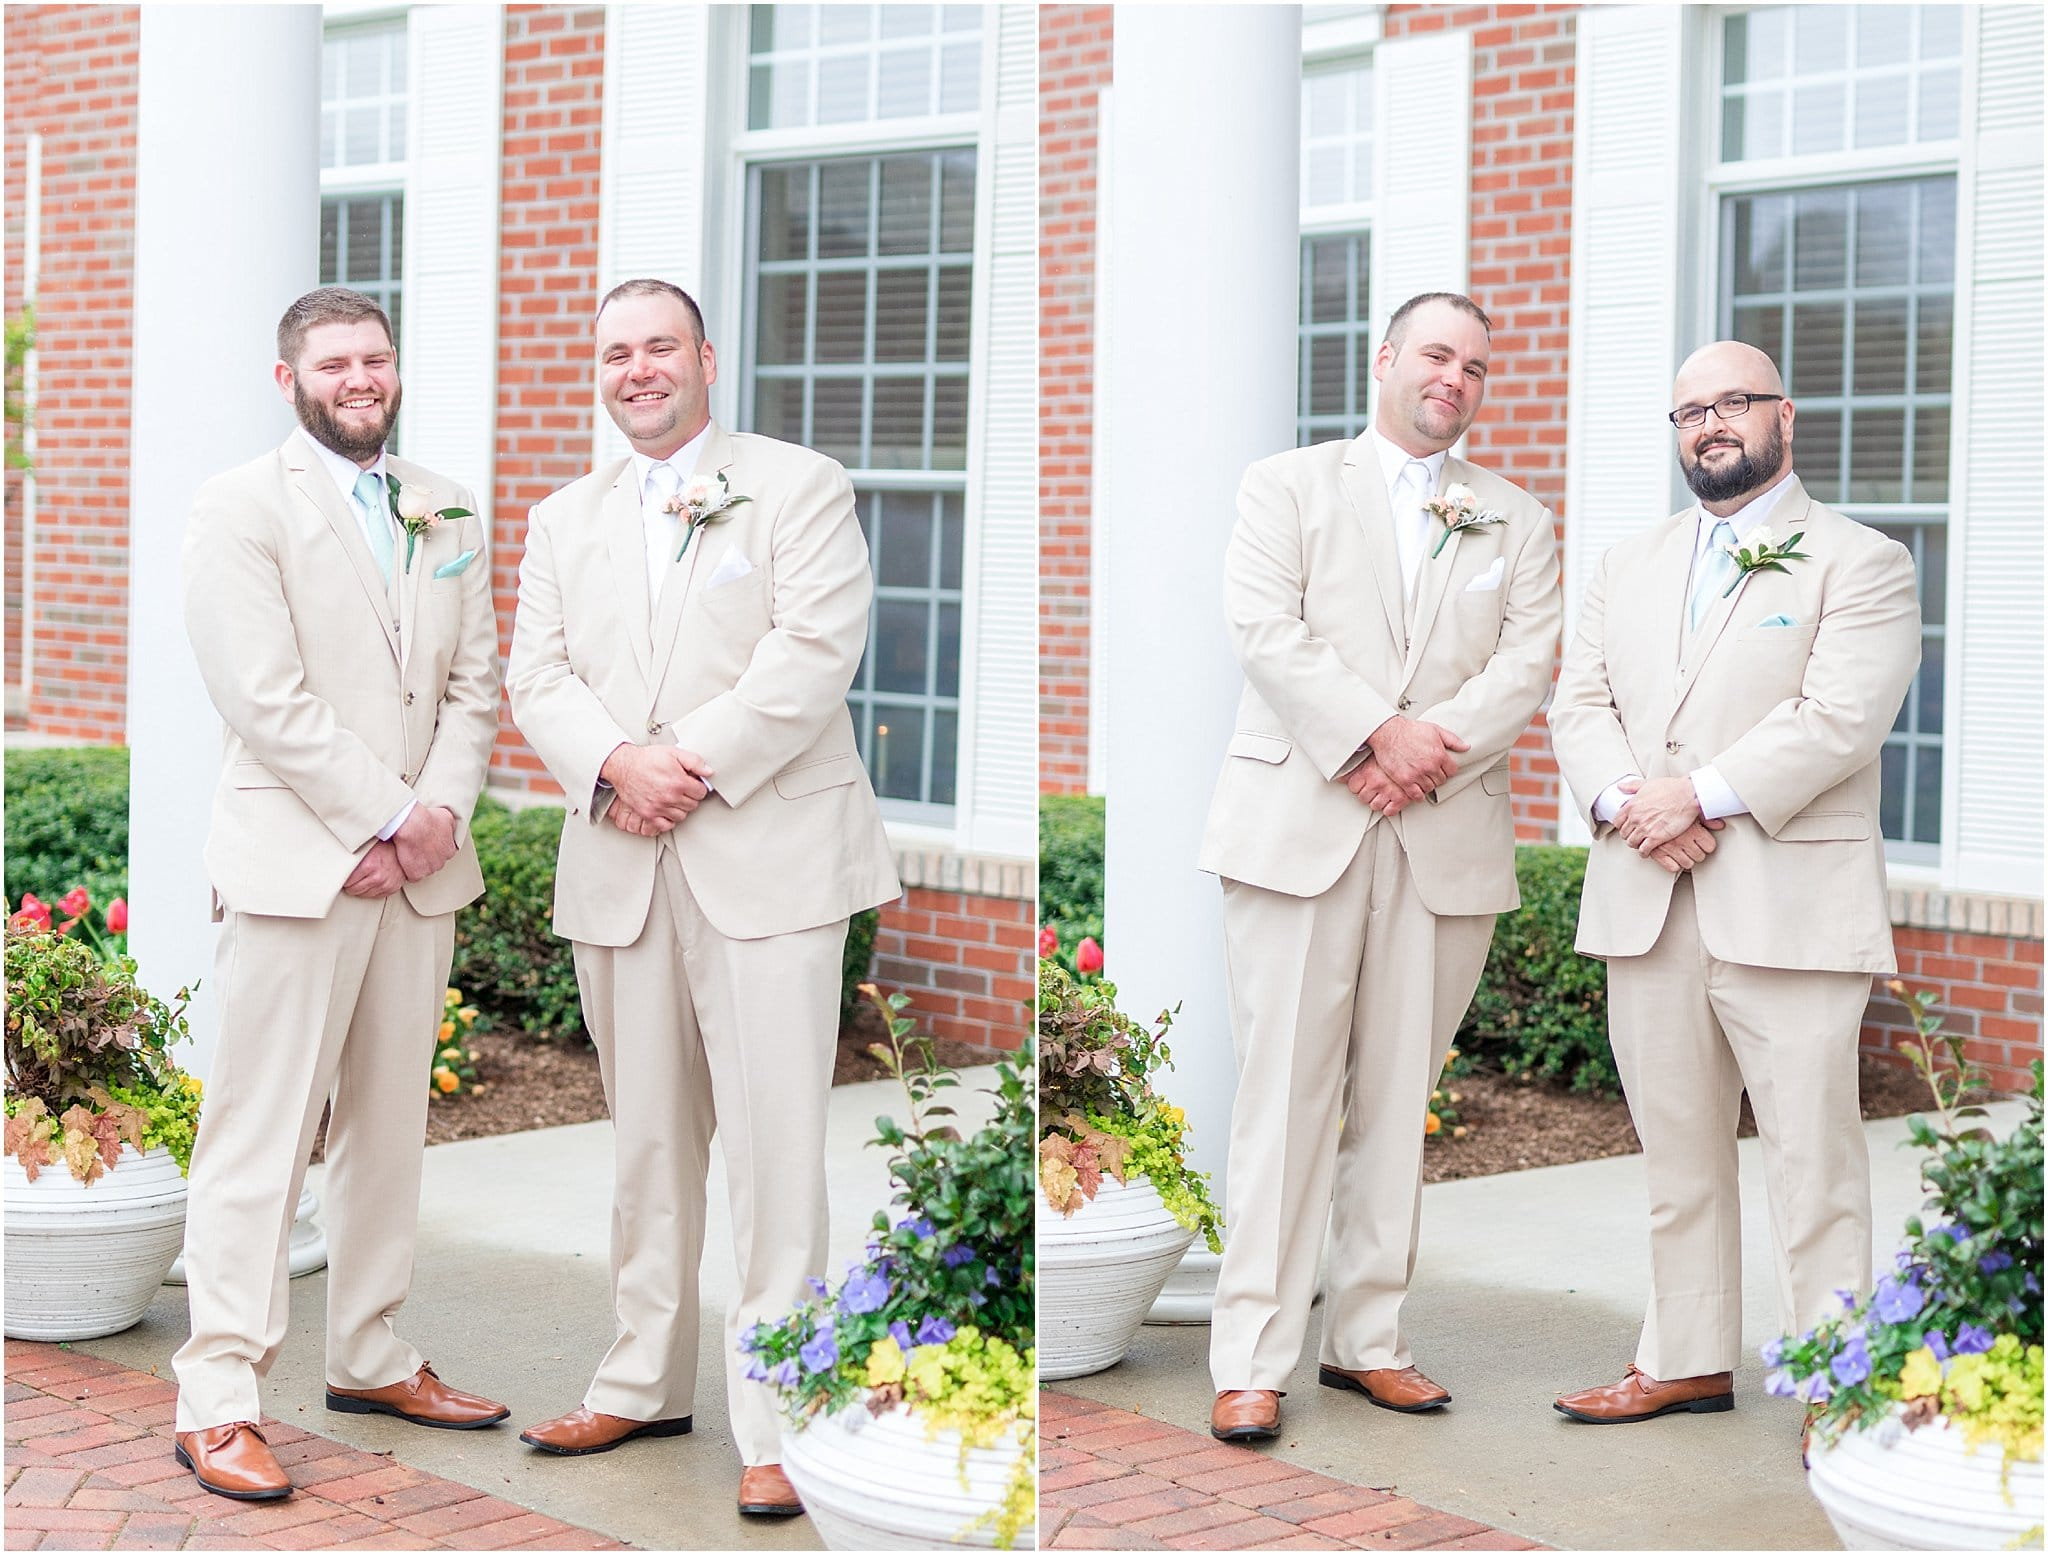 jessscott-milsboro-delaware-wedding-cassidymrphotography_0035